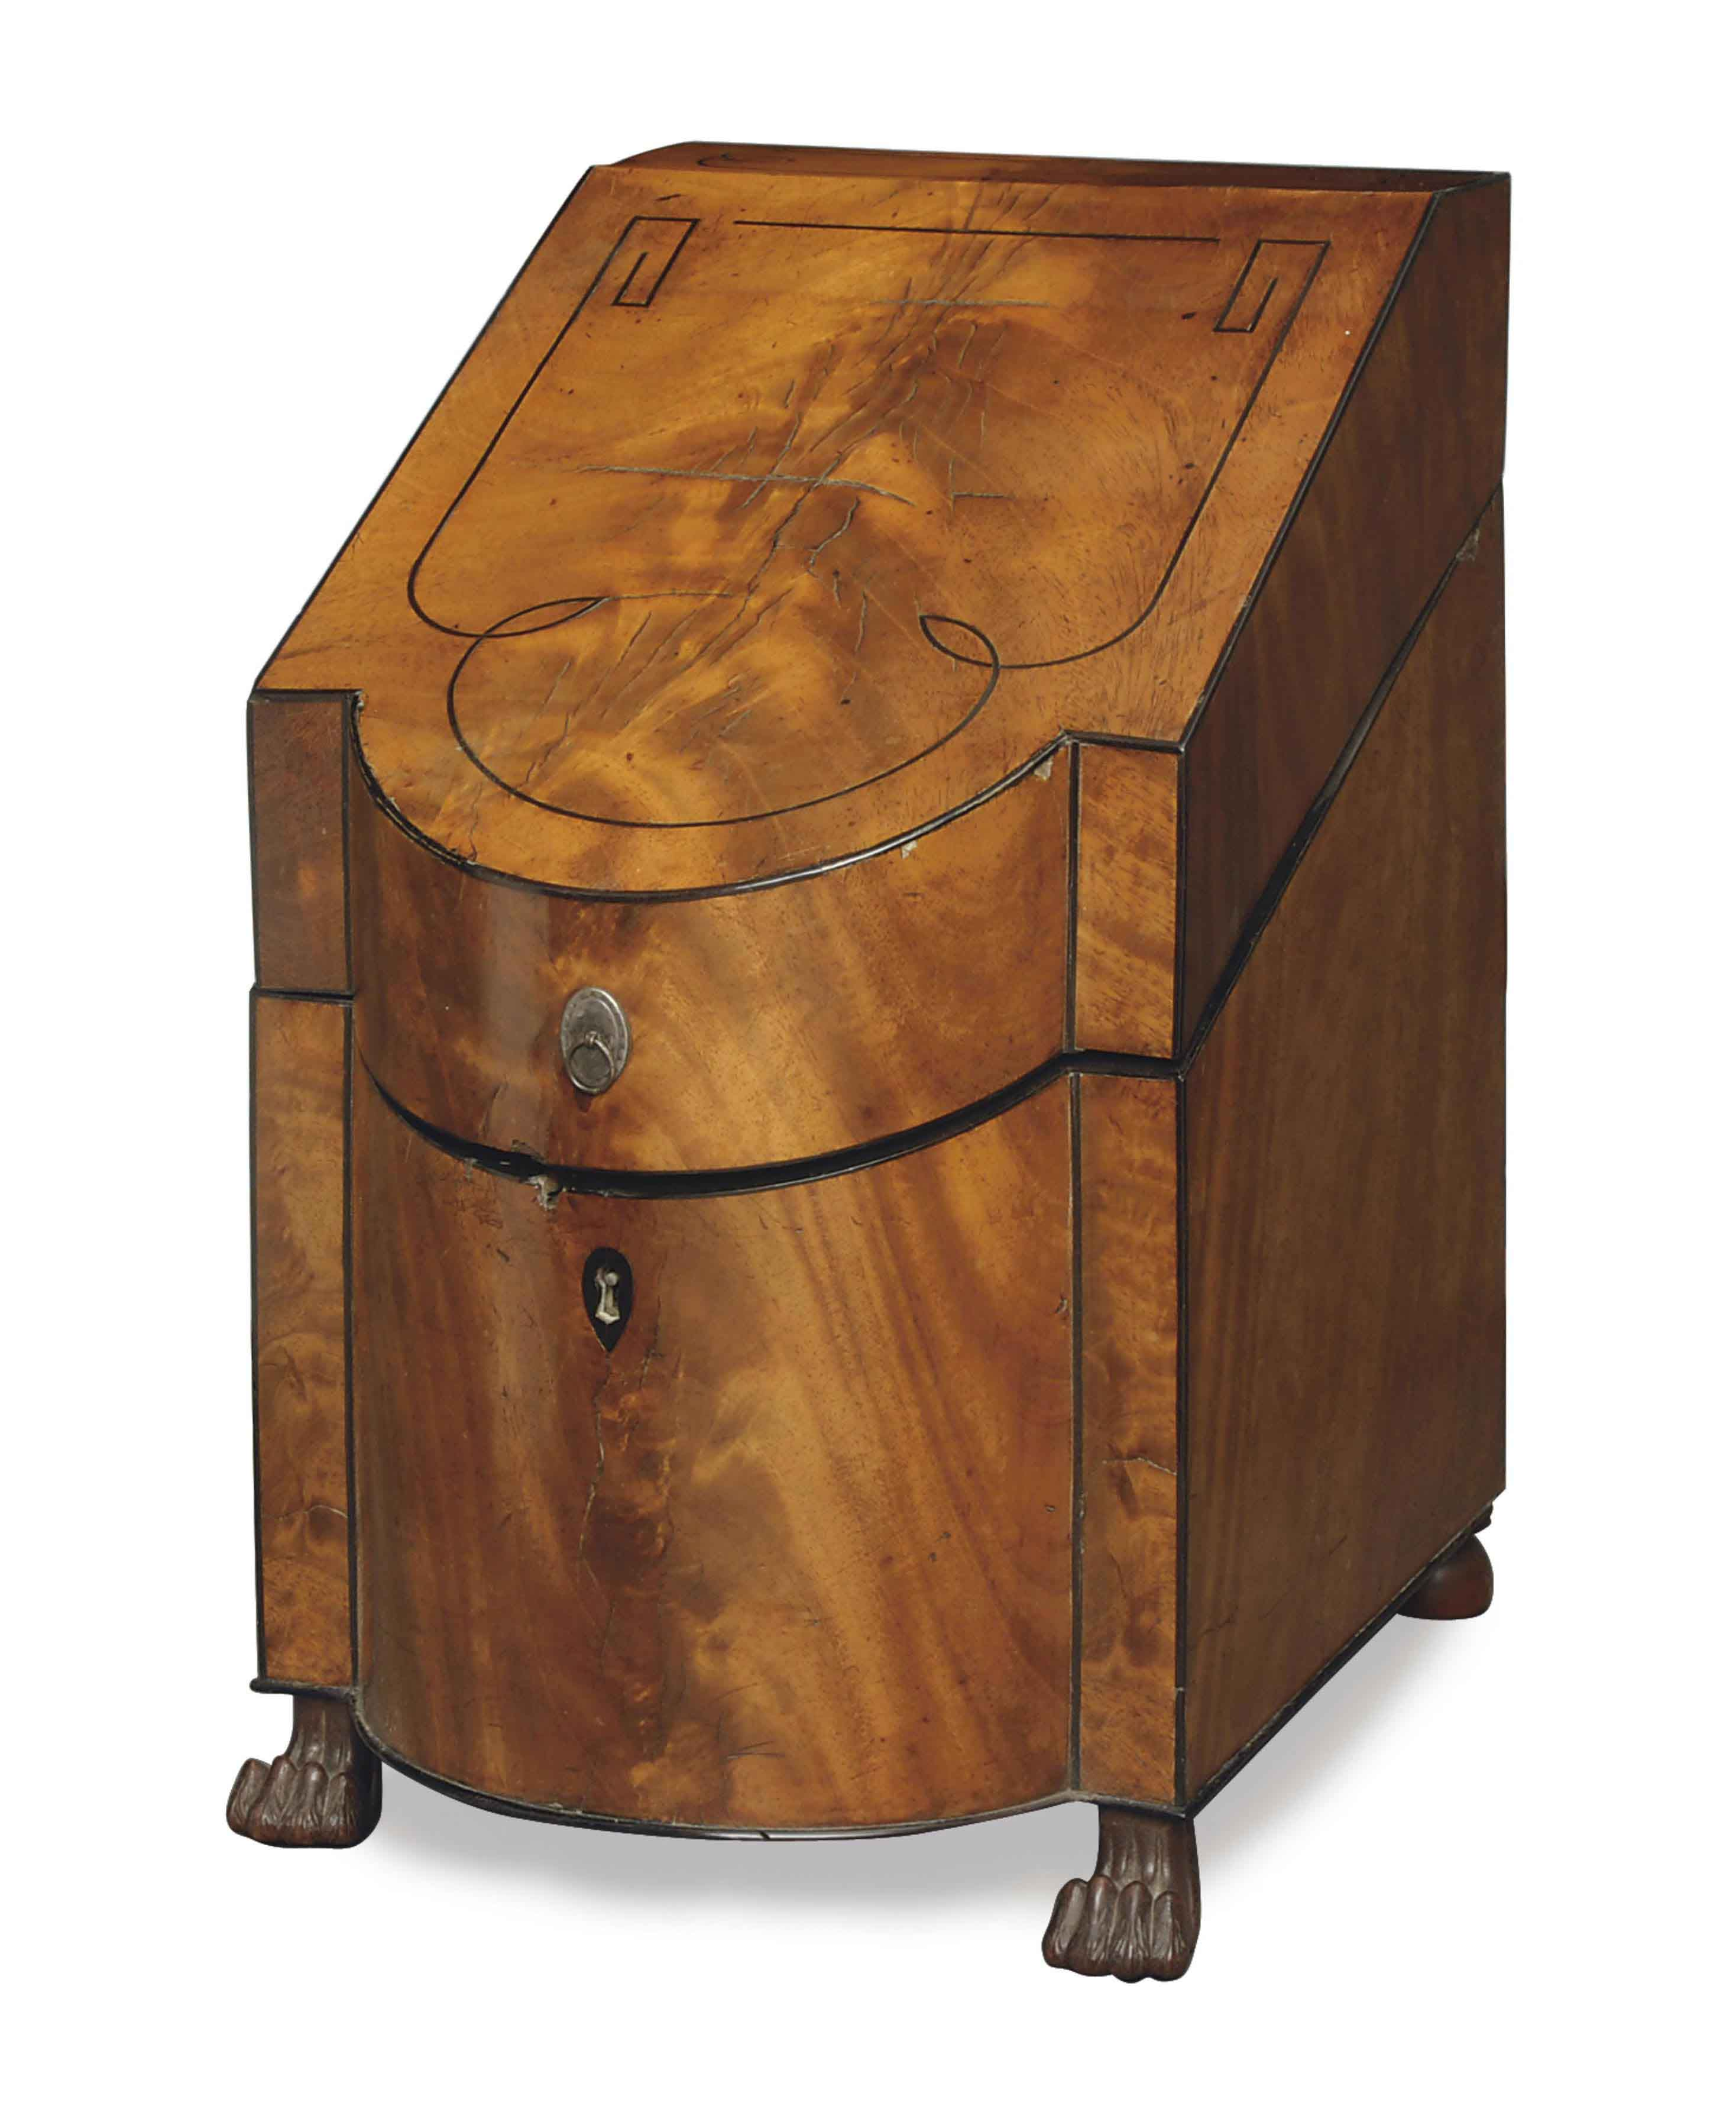 A REGENCY INLAID MAHOGANY CUTLERY BOX,